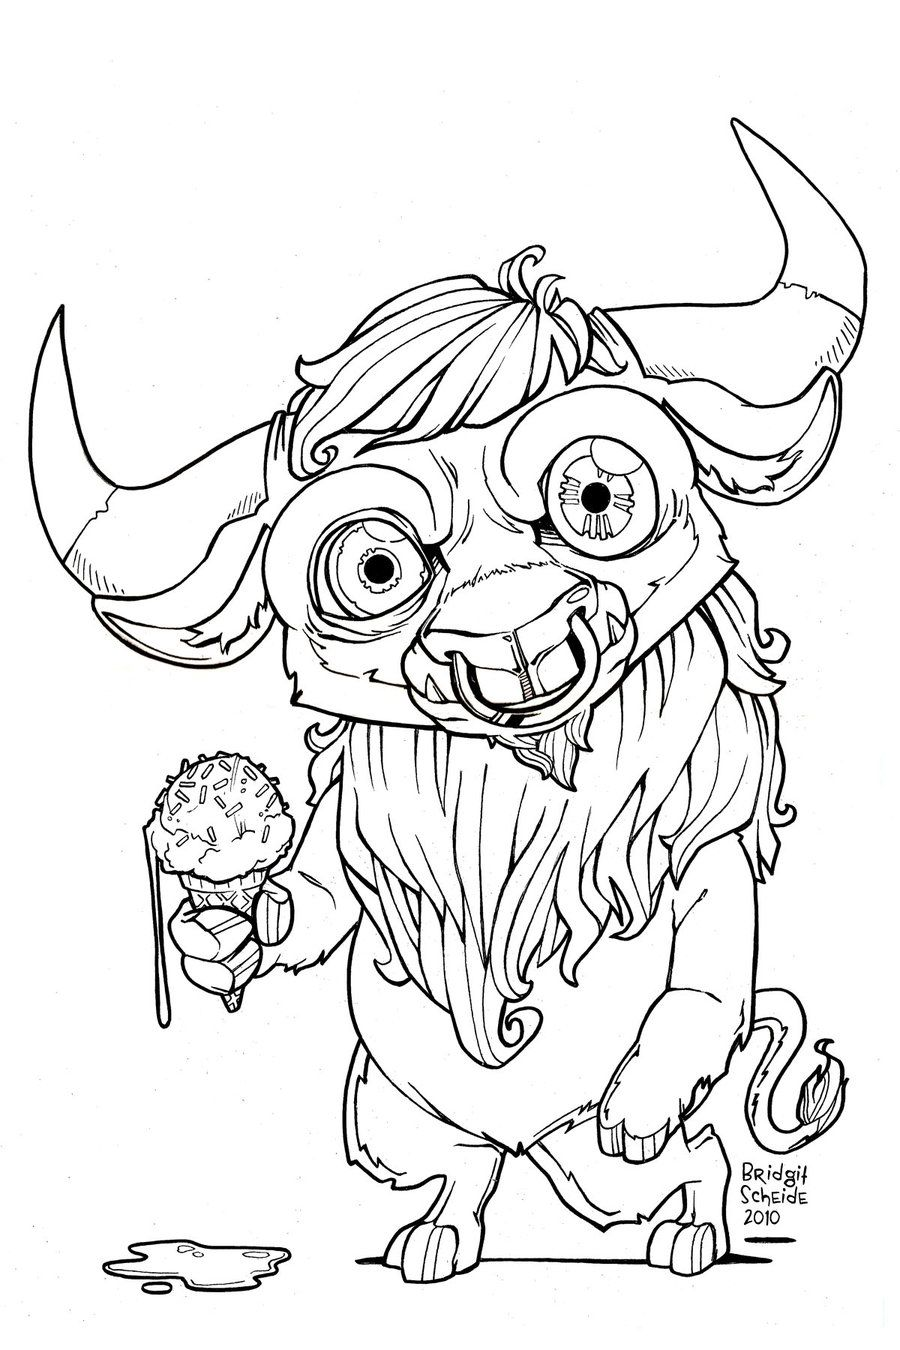 Minotaur Colouring Page Mysteries Myths Legends Pinterest Minotaur Coloring Pages